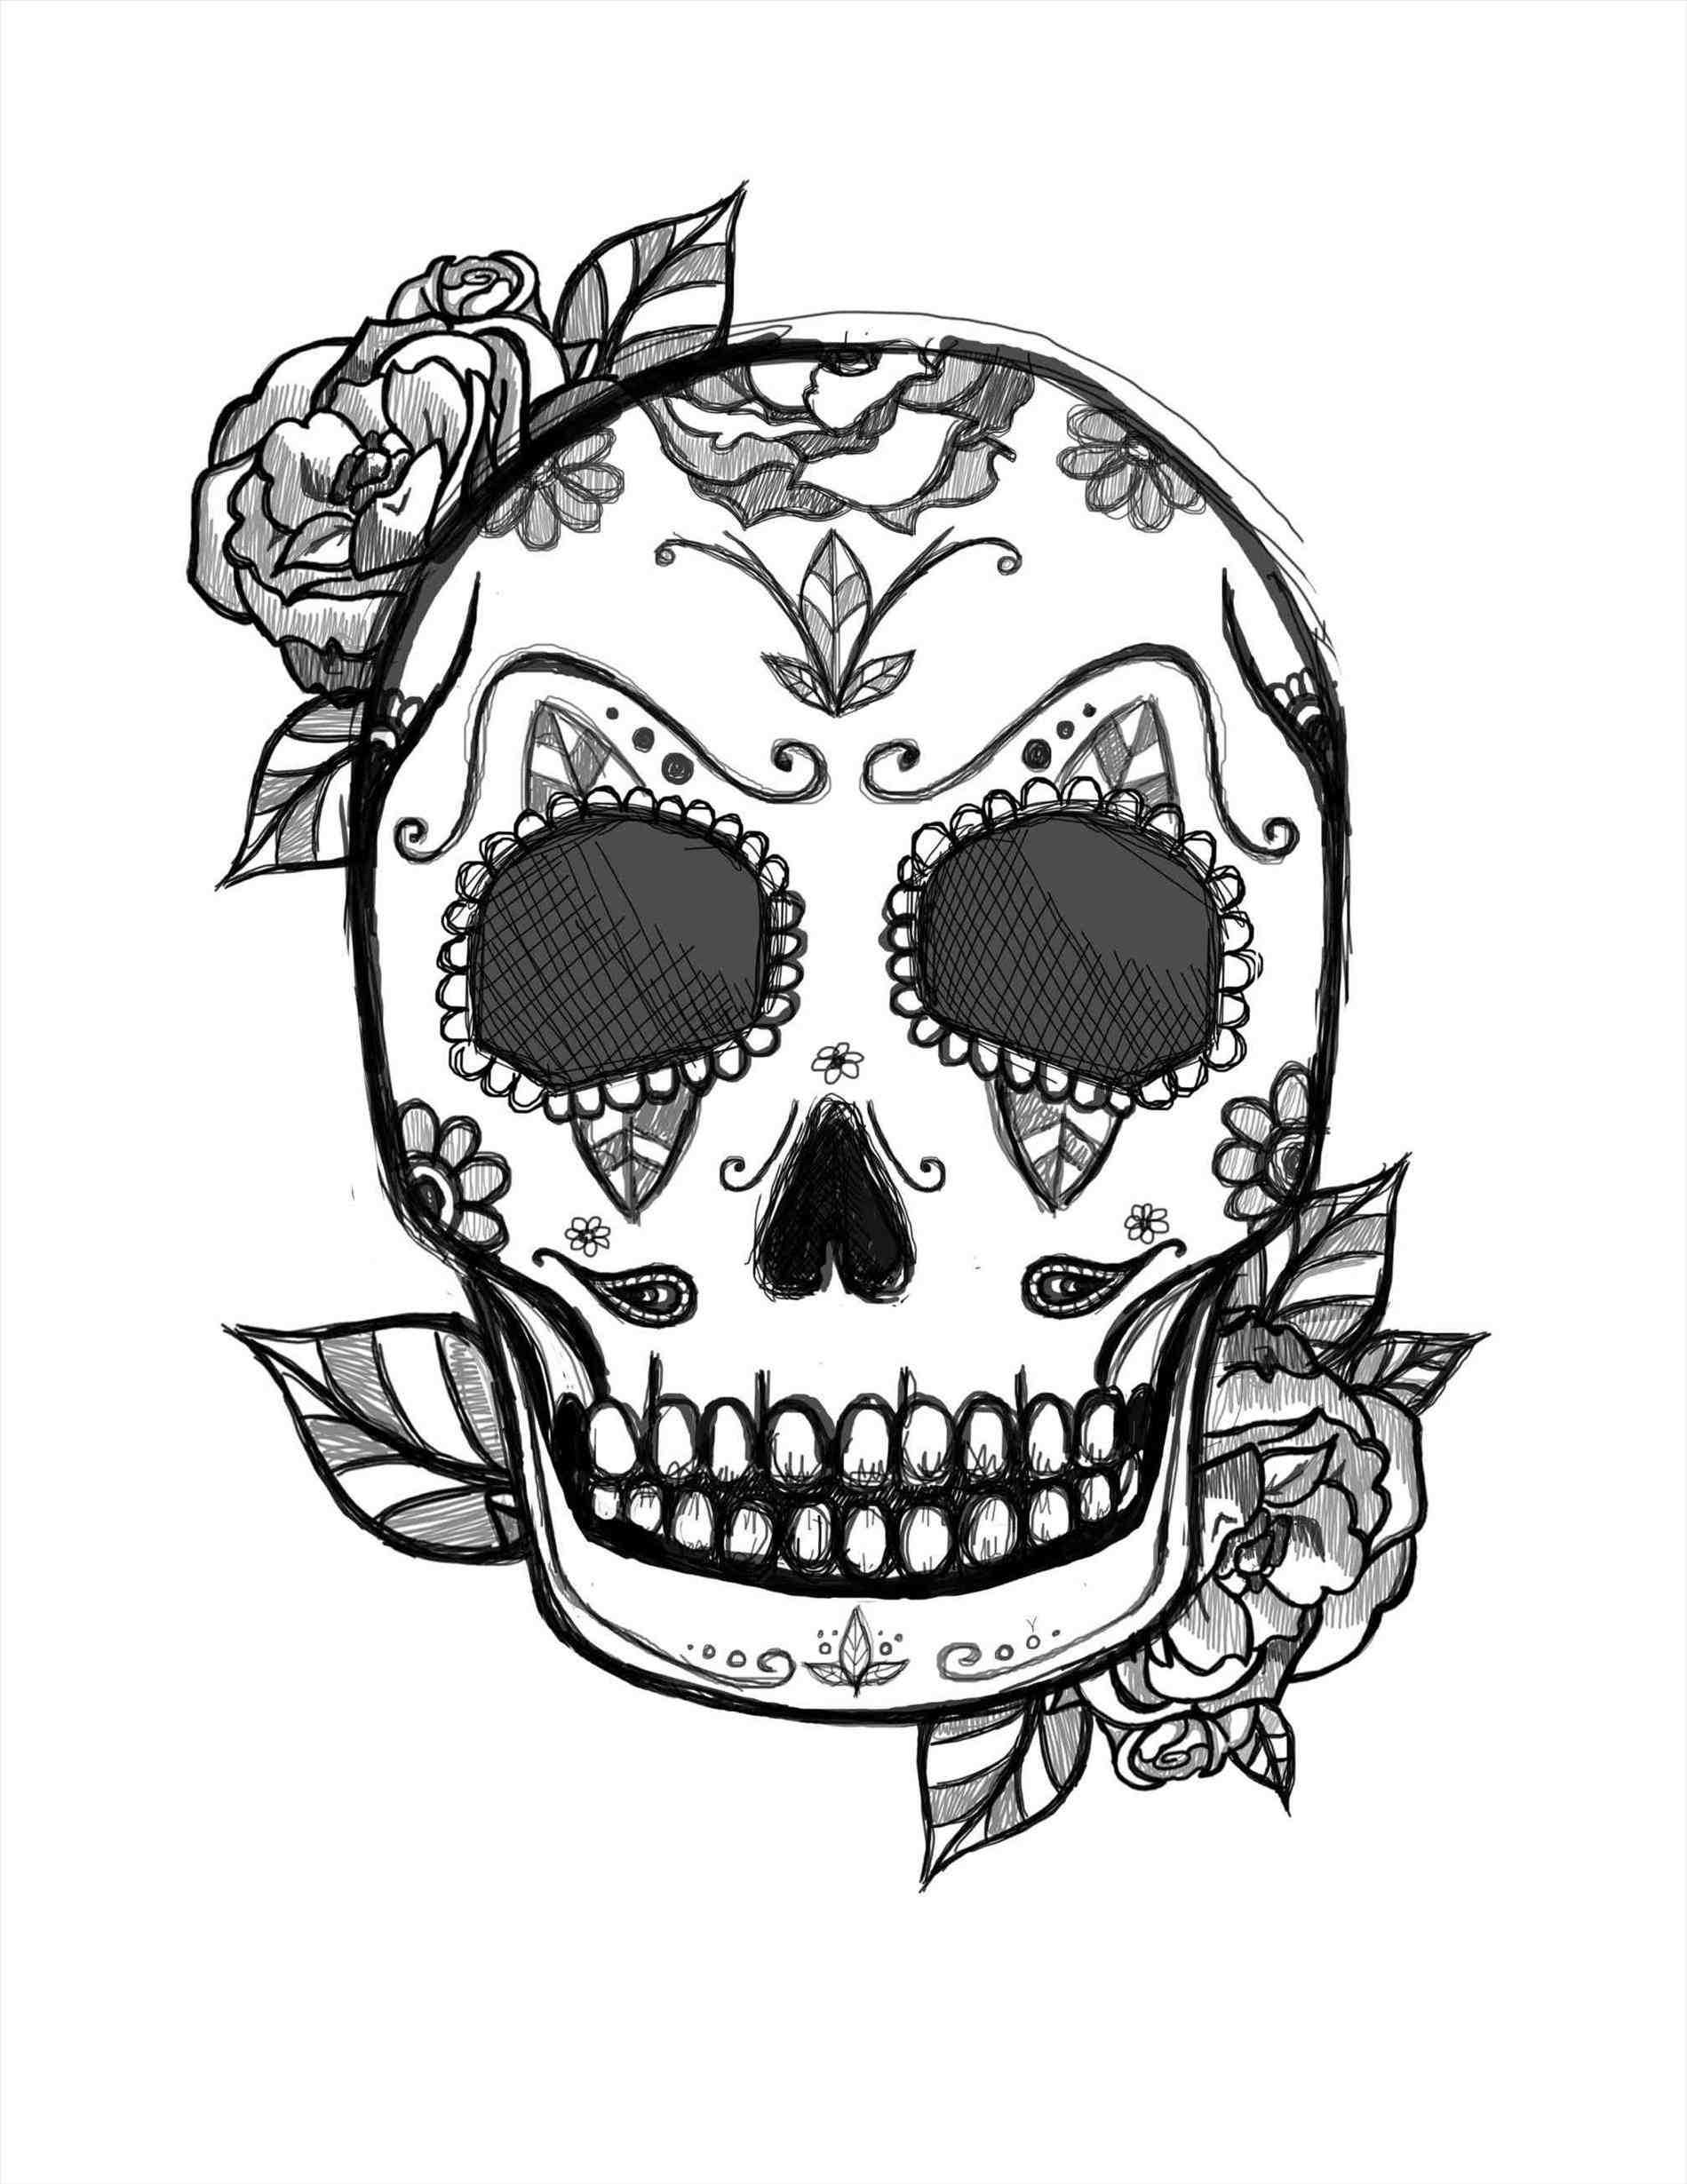 1899x2459 Cool Simple Drawings Of Skulls